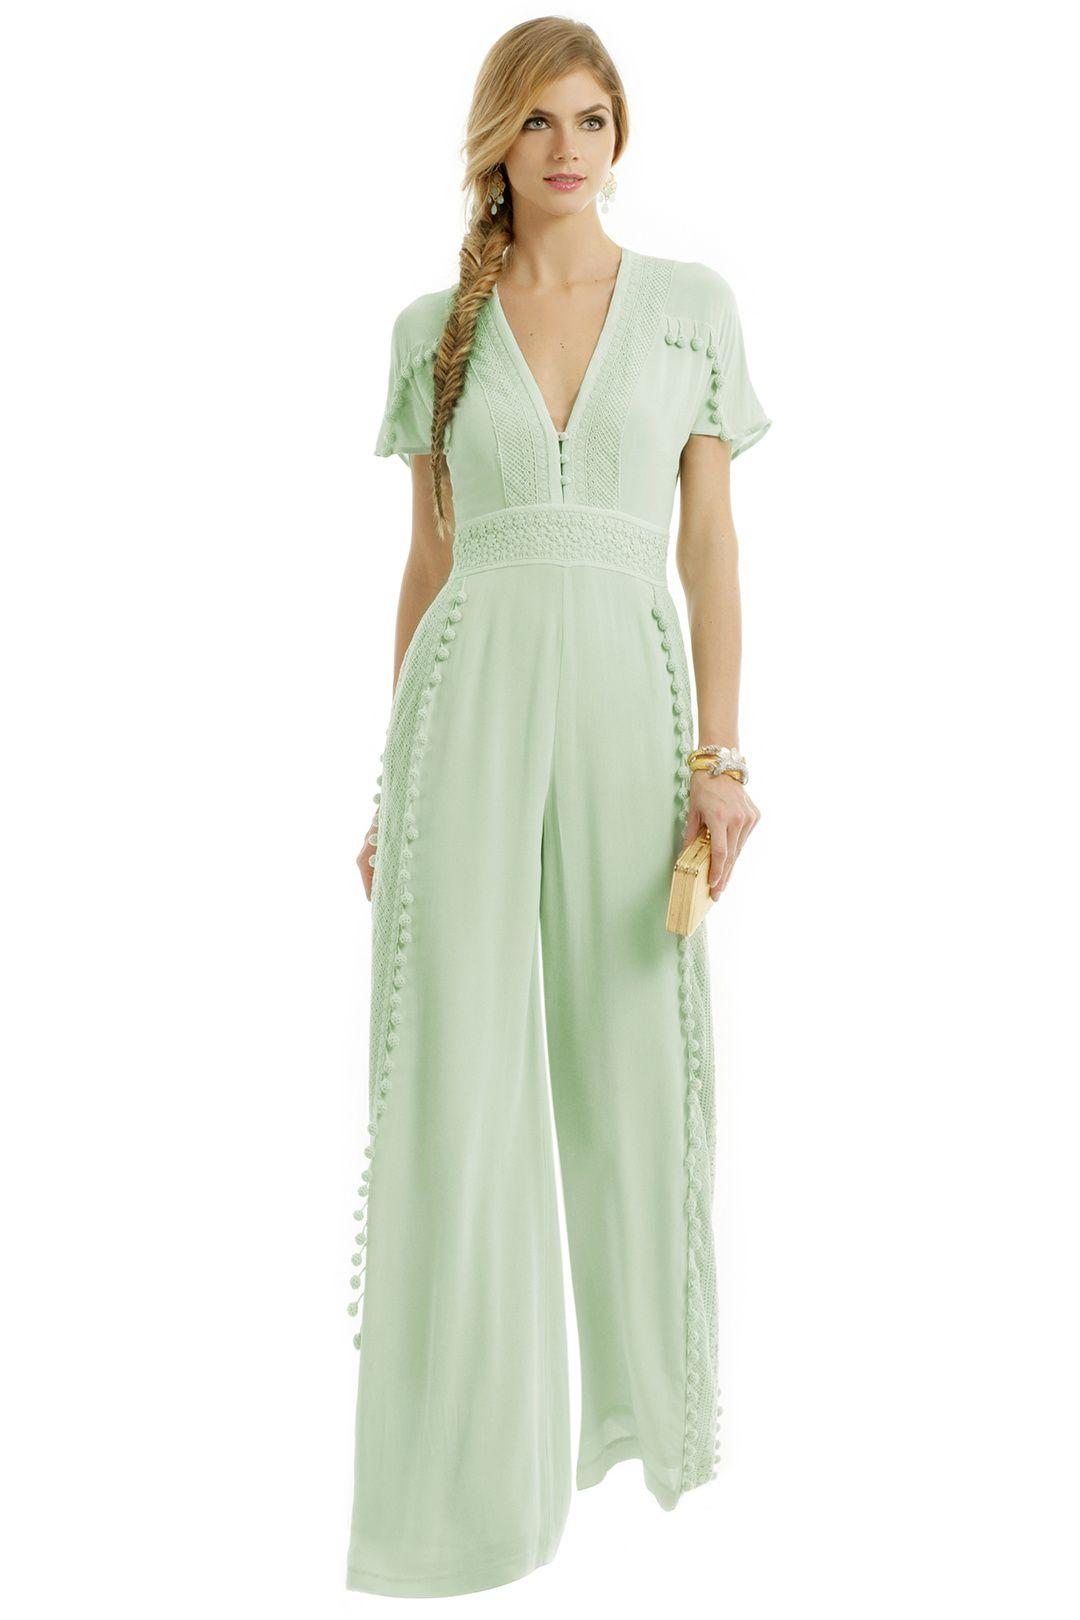 Marchesa Voyage Joplin Jumpsuit Bridesmaids Jumpsuits Dressy Tops For Wedding Dresses